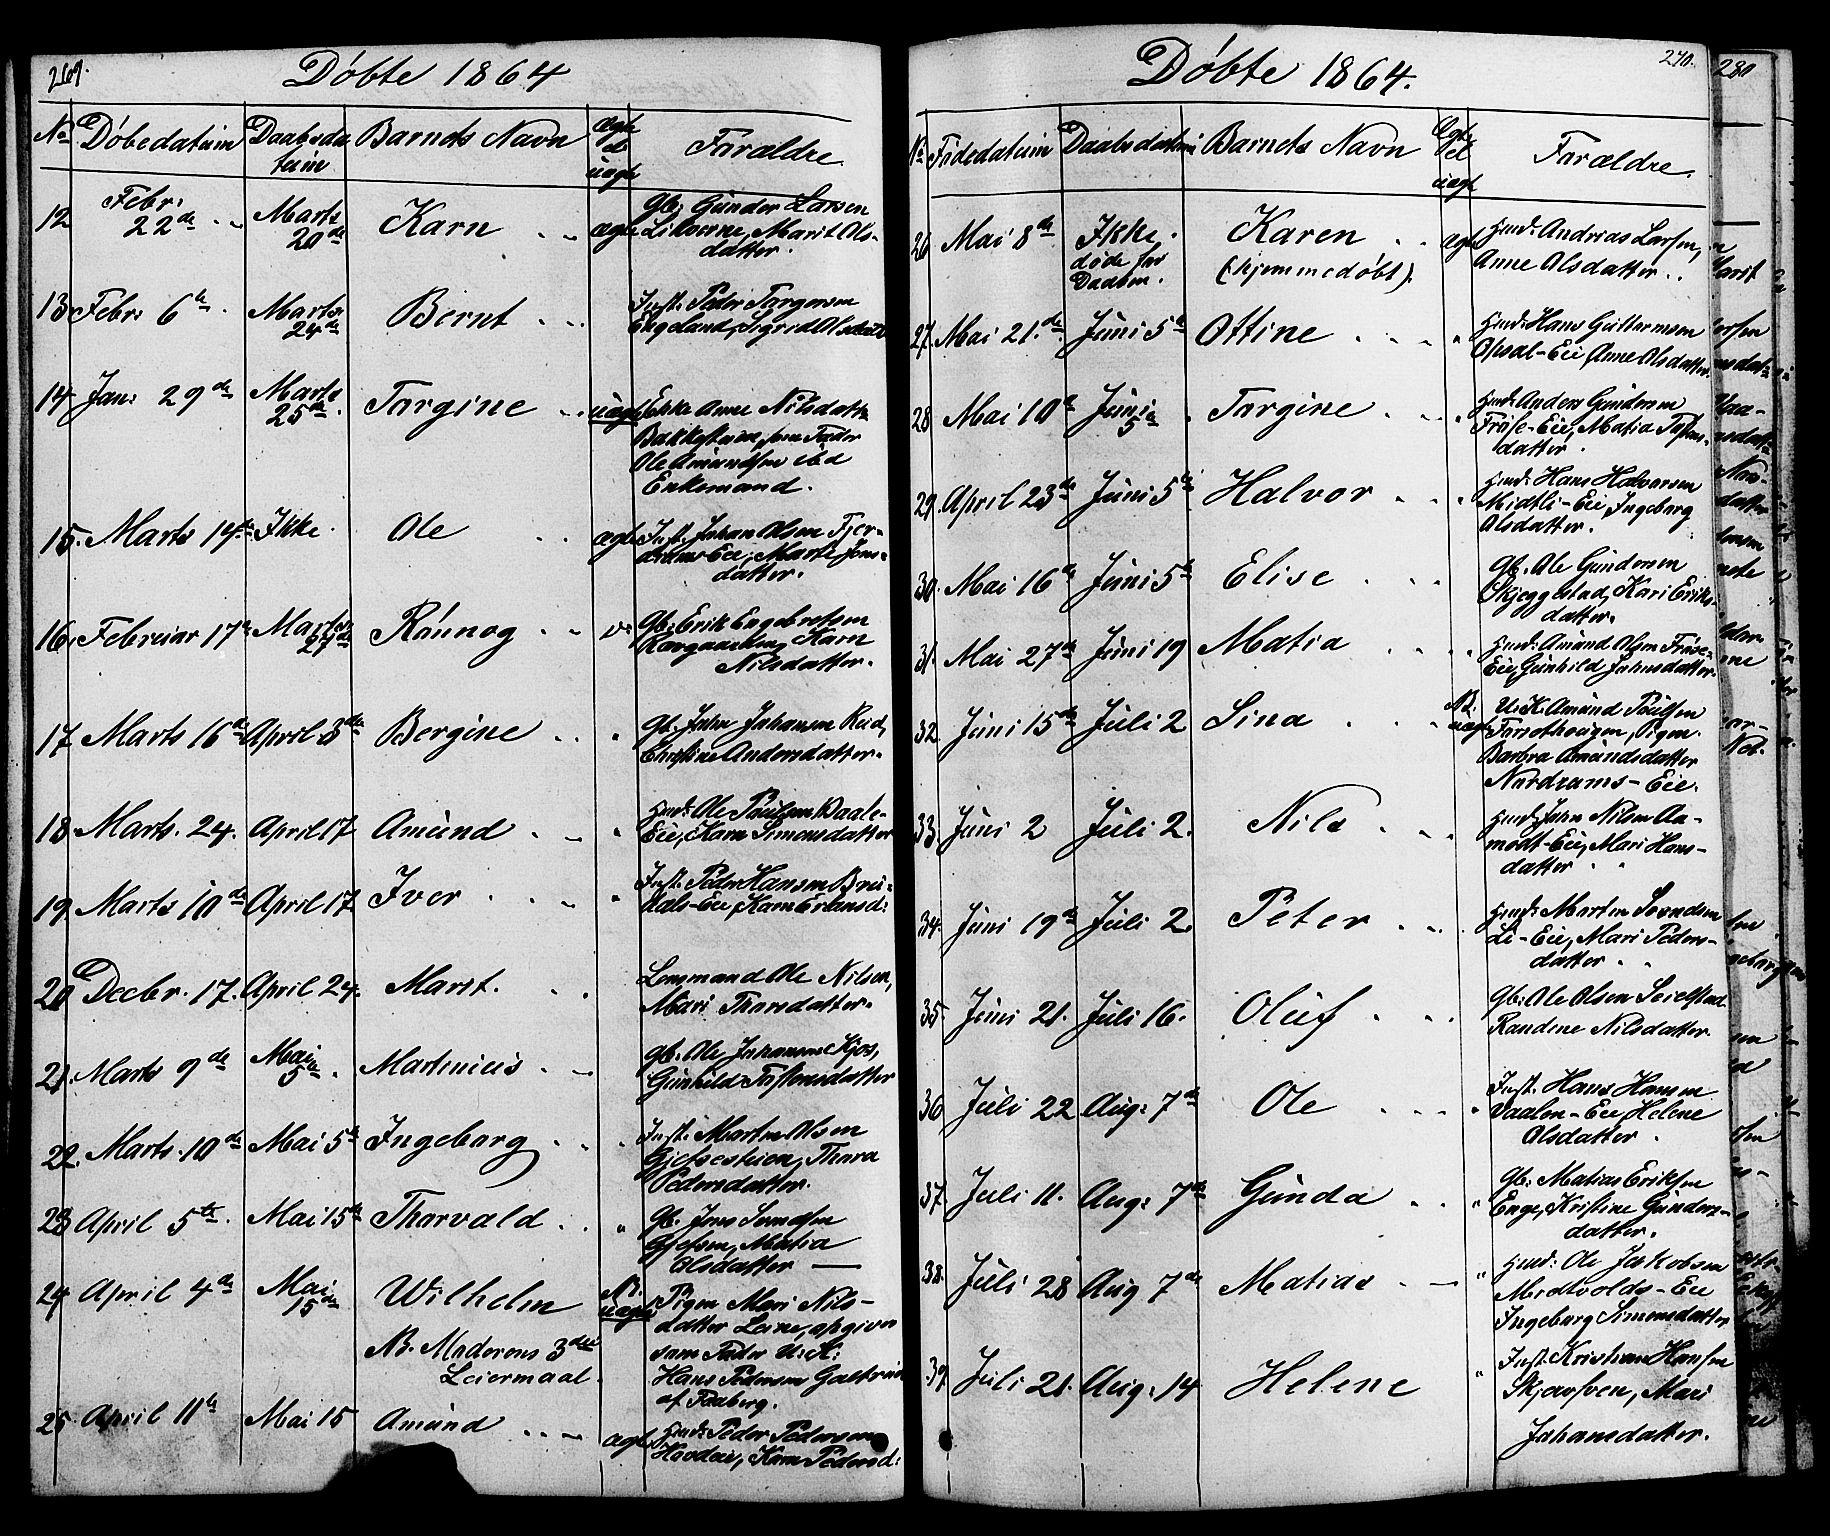 SAH, Østre Gausdal prestekontor, Klokkerbok nr. 1, 1863-1893, s. 269-270